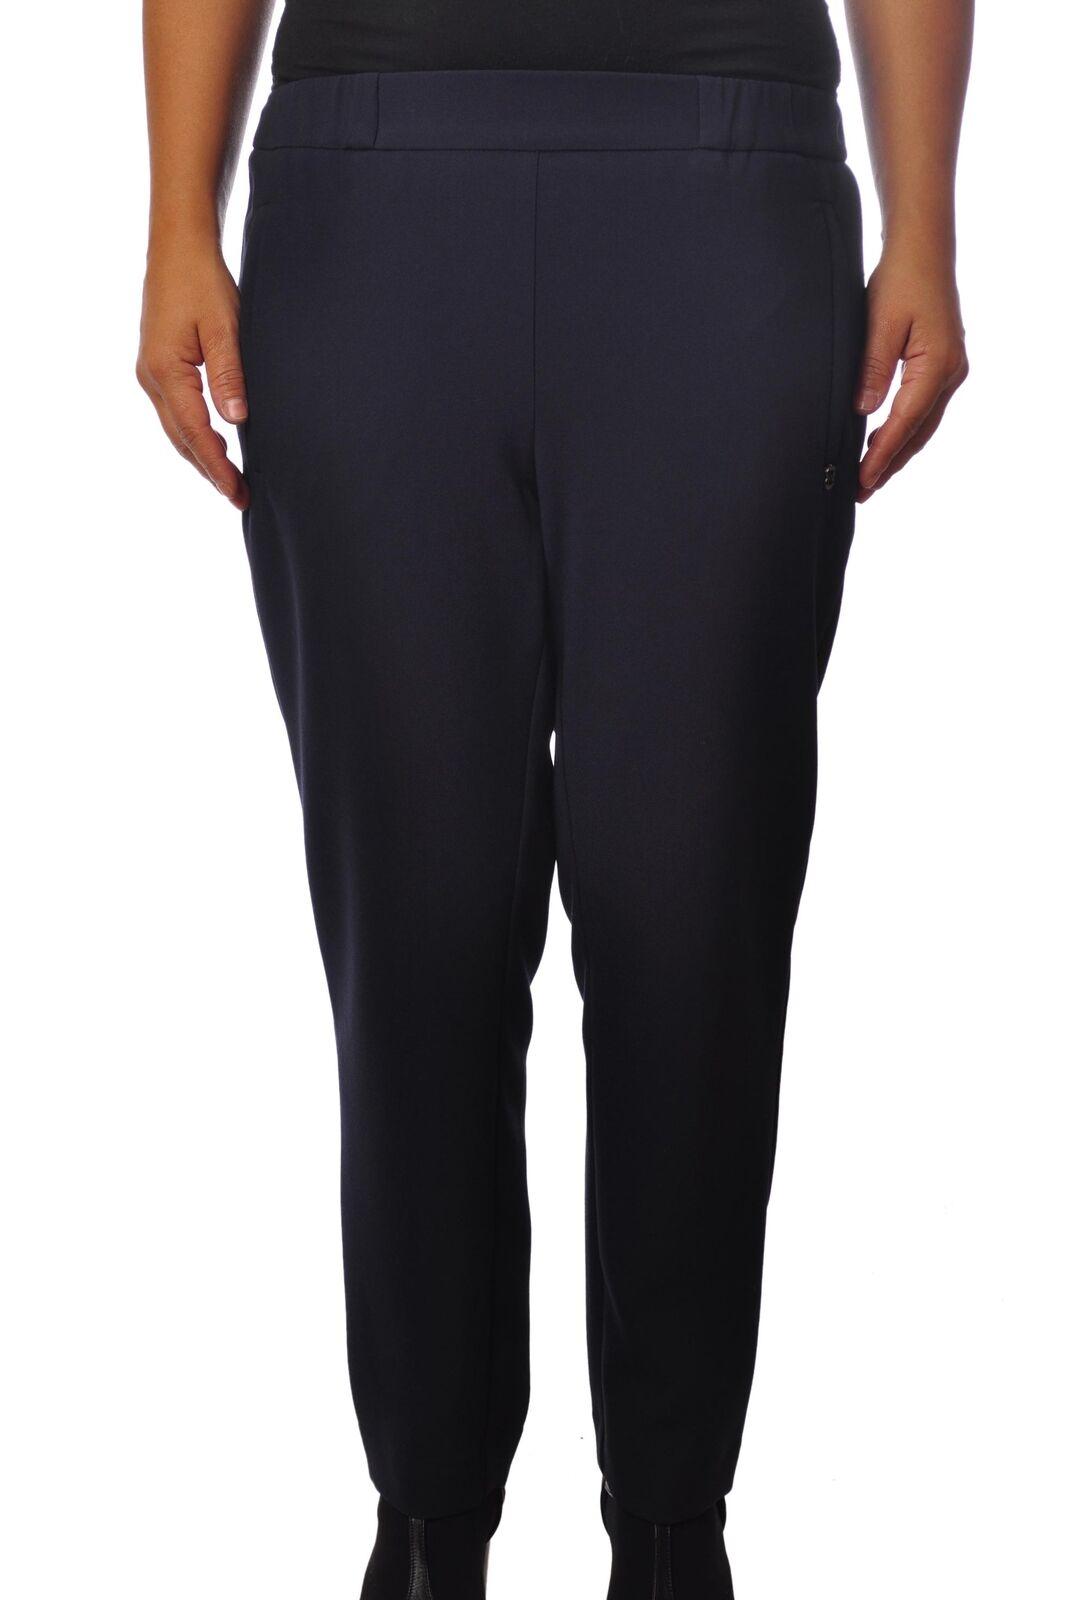 Ottod'ame  -  Pants - Female - Blau - 4147428A184424